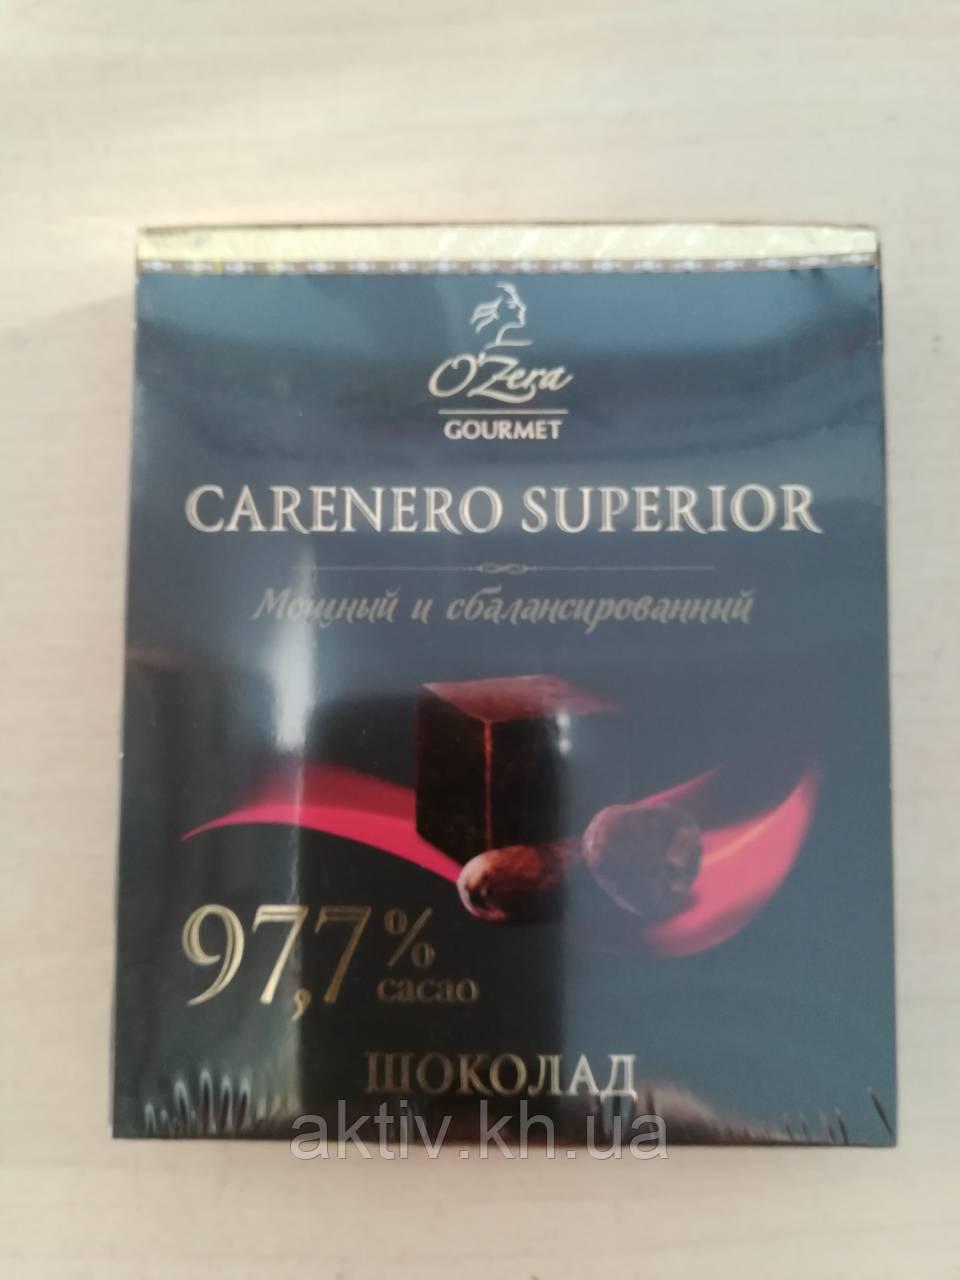 Шоколад Ozera Caranero 97,7% Superior 90 гр